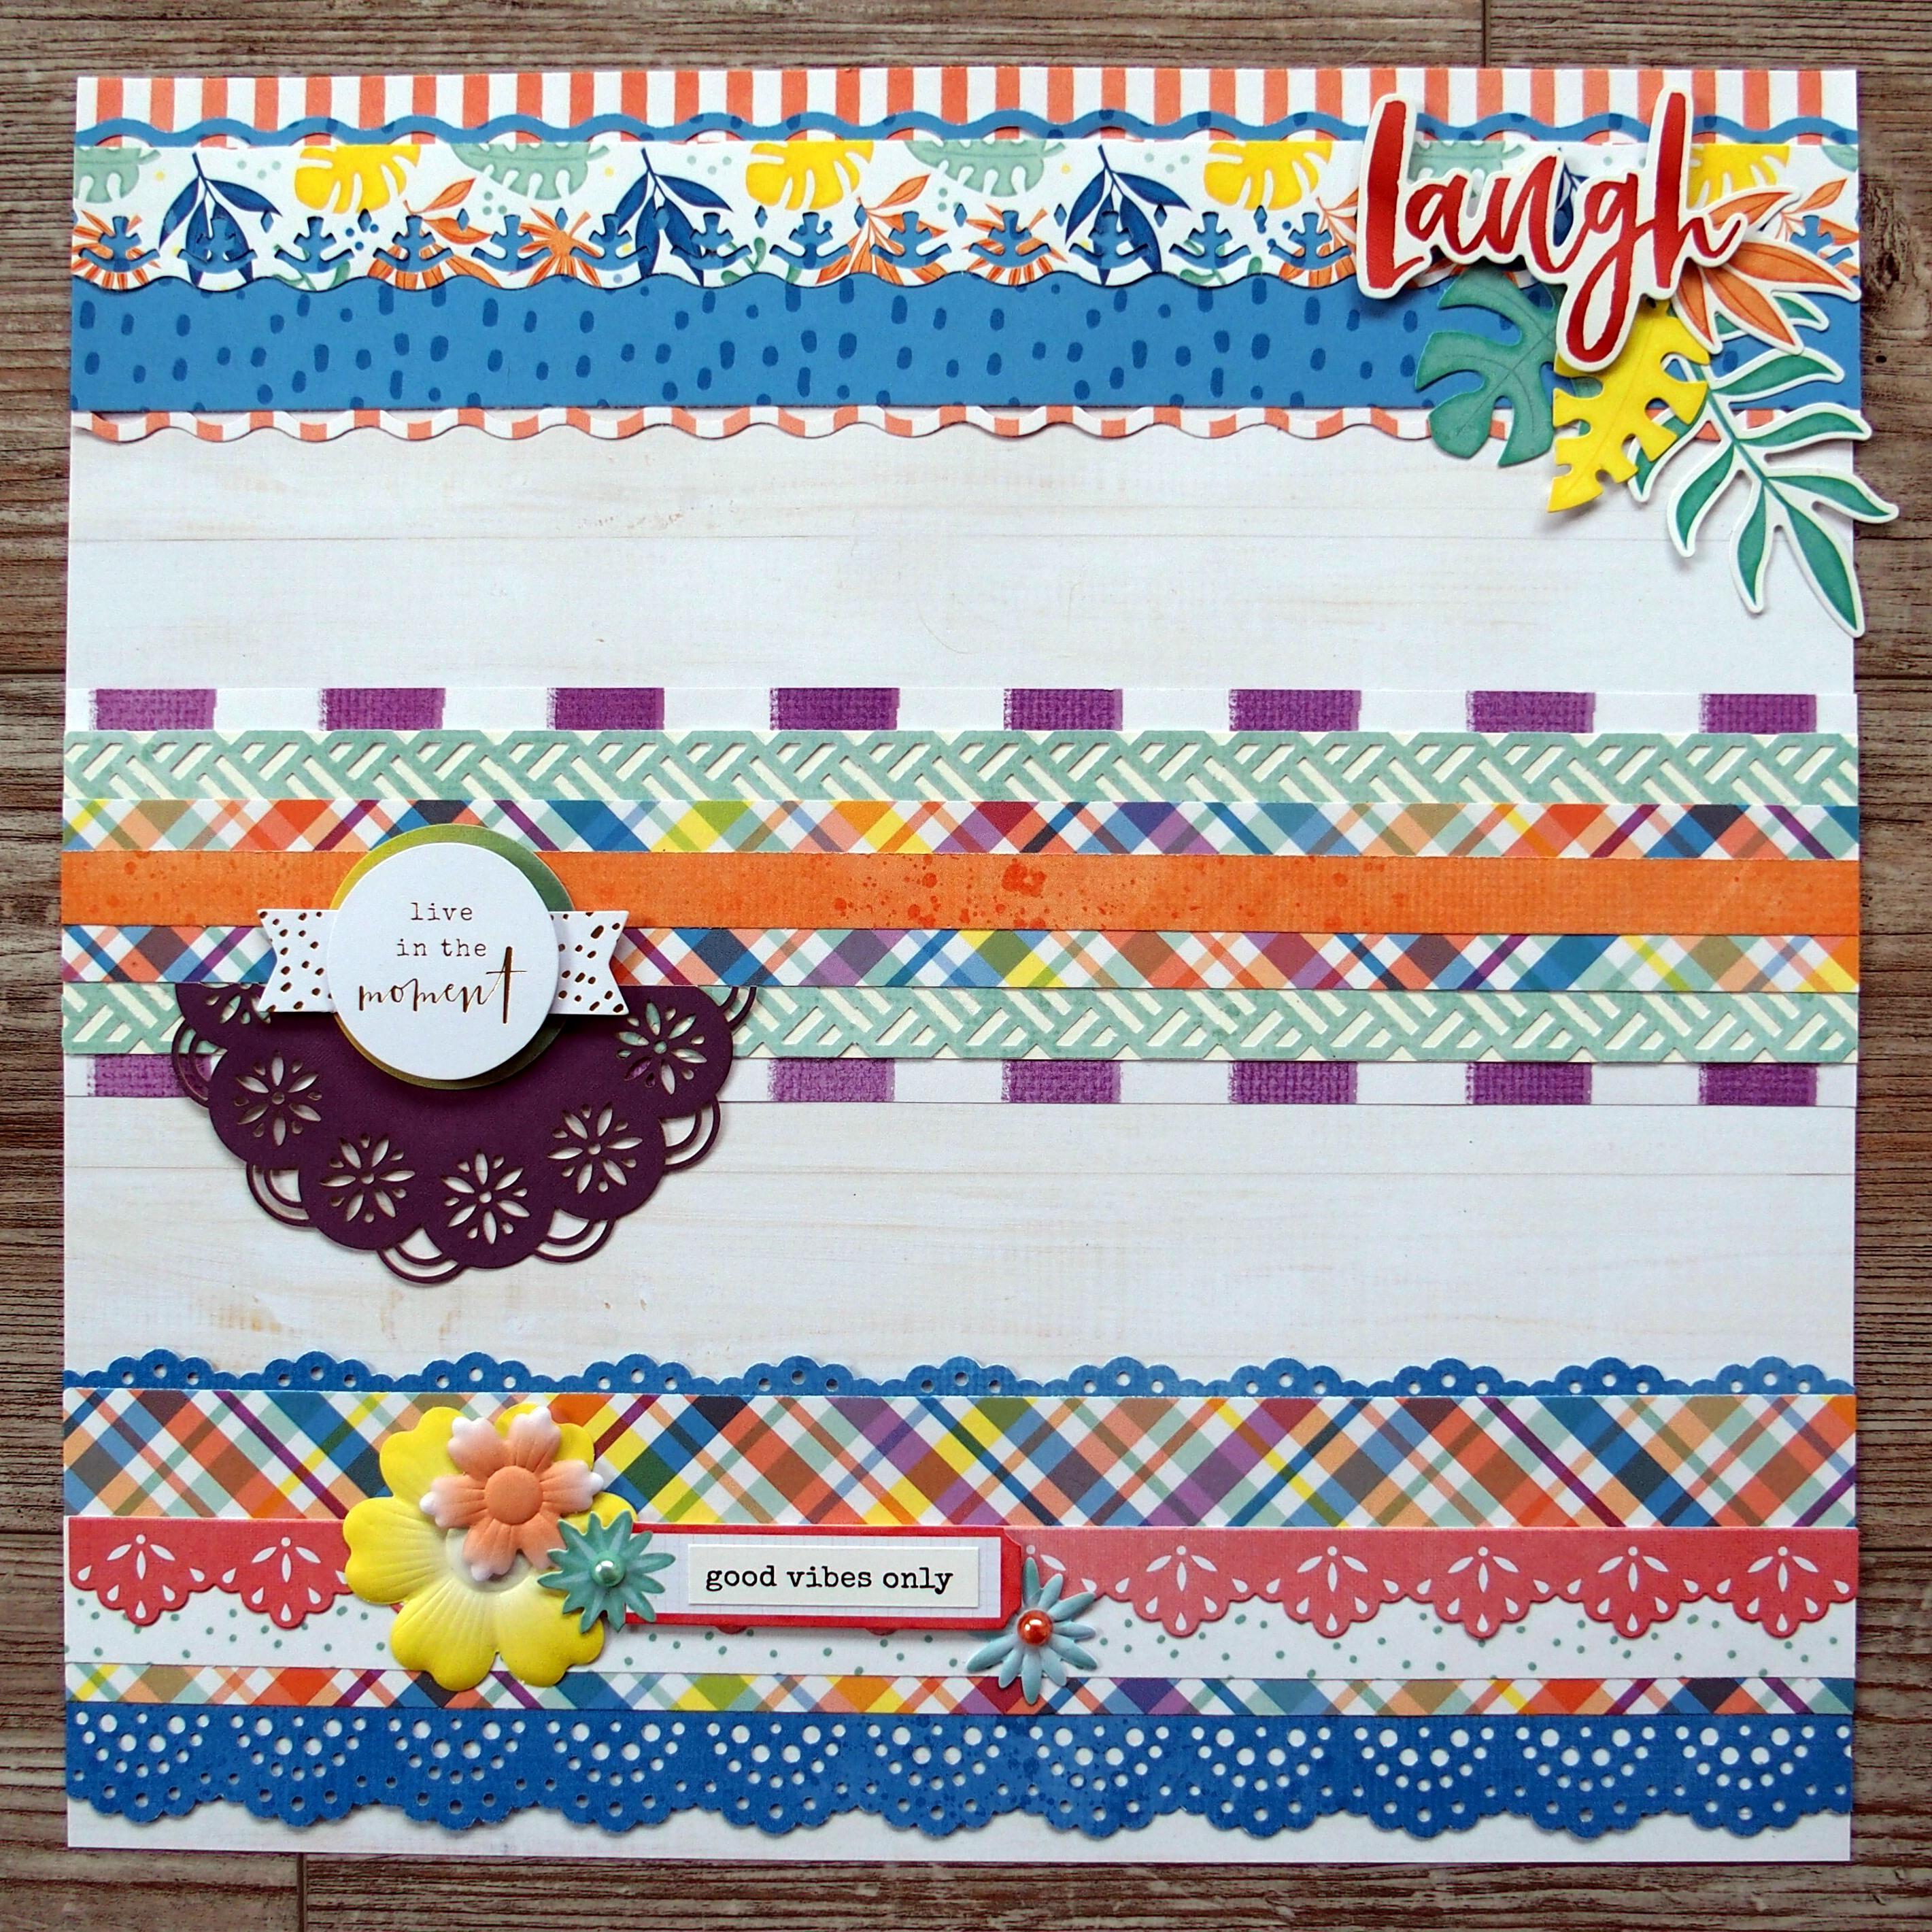 Rainbow-Rush-Collection-Scrapbooking-Borders-Creative-Memories-16